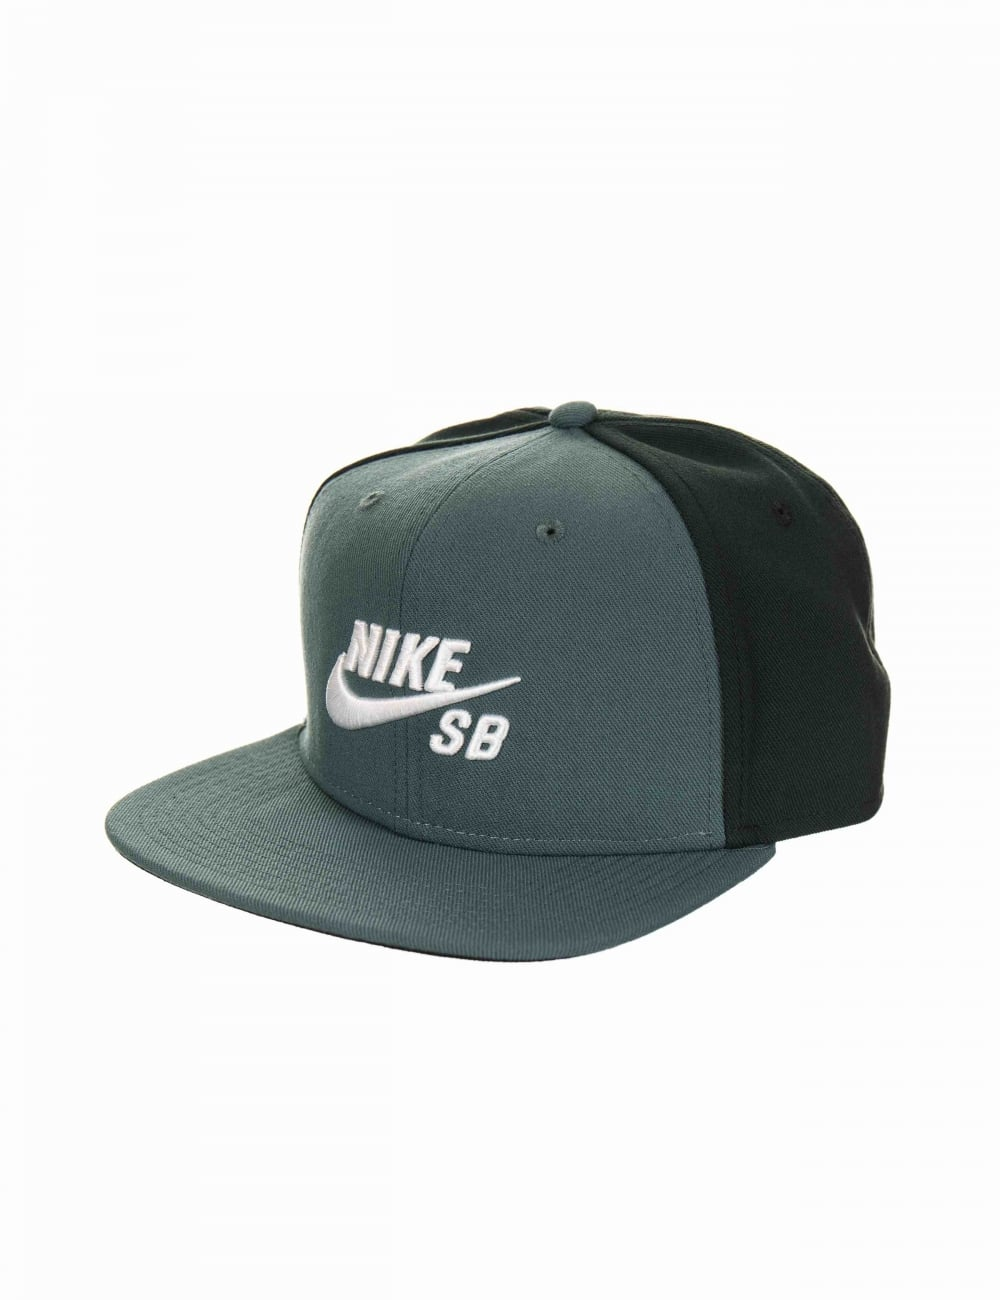 Nike SB Icon Logo Pro Snapback Hat - Hasta Seaweed - Hat Shop from ... 37fb5bb537b